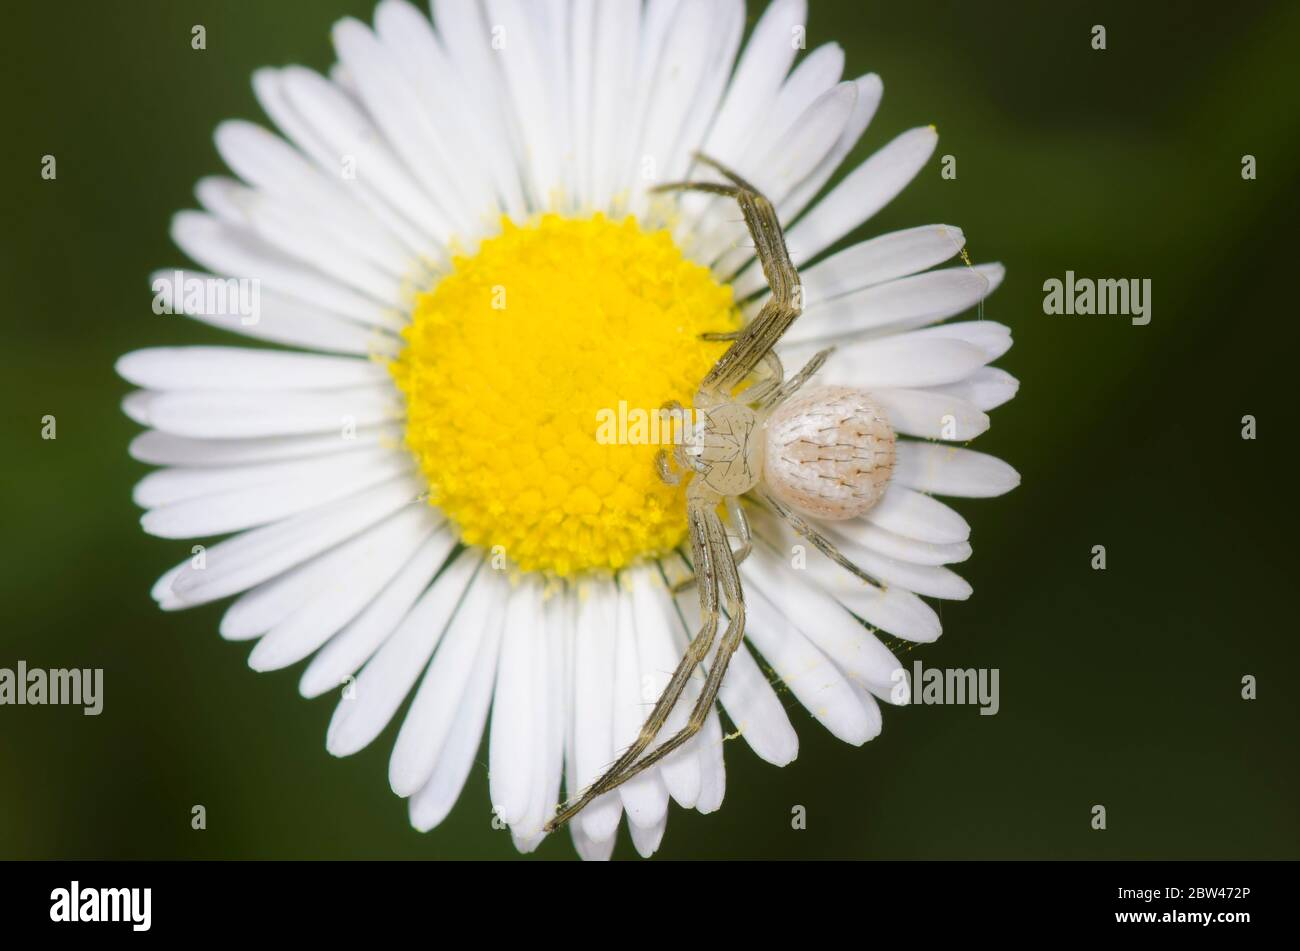 Crab Spider, Mecaphesa sp., lurking on Fleabane, Erigeron sp. Stock Photo